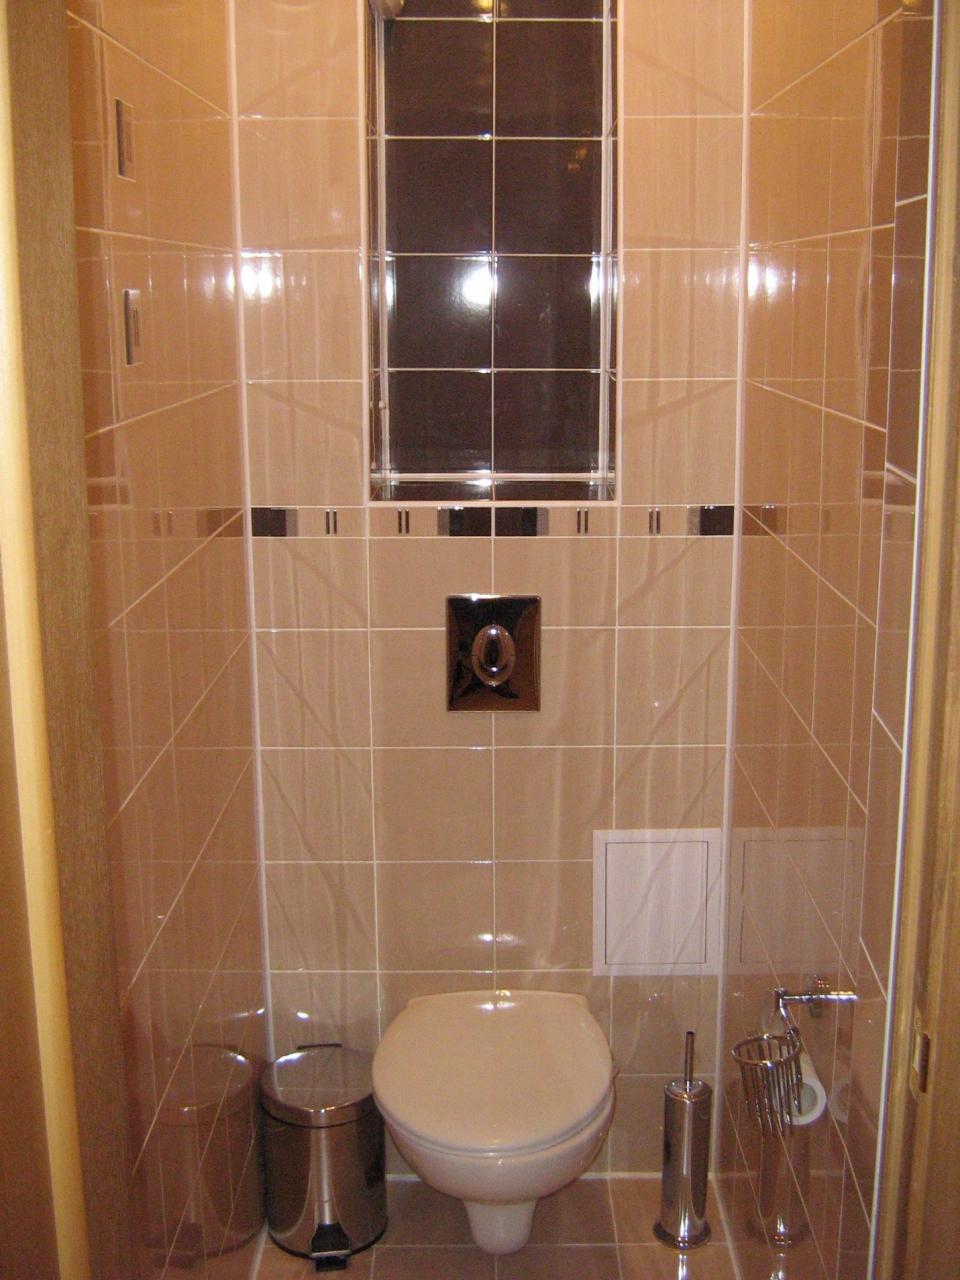 Фото ремонт ванной комнаты и туалета под ключ